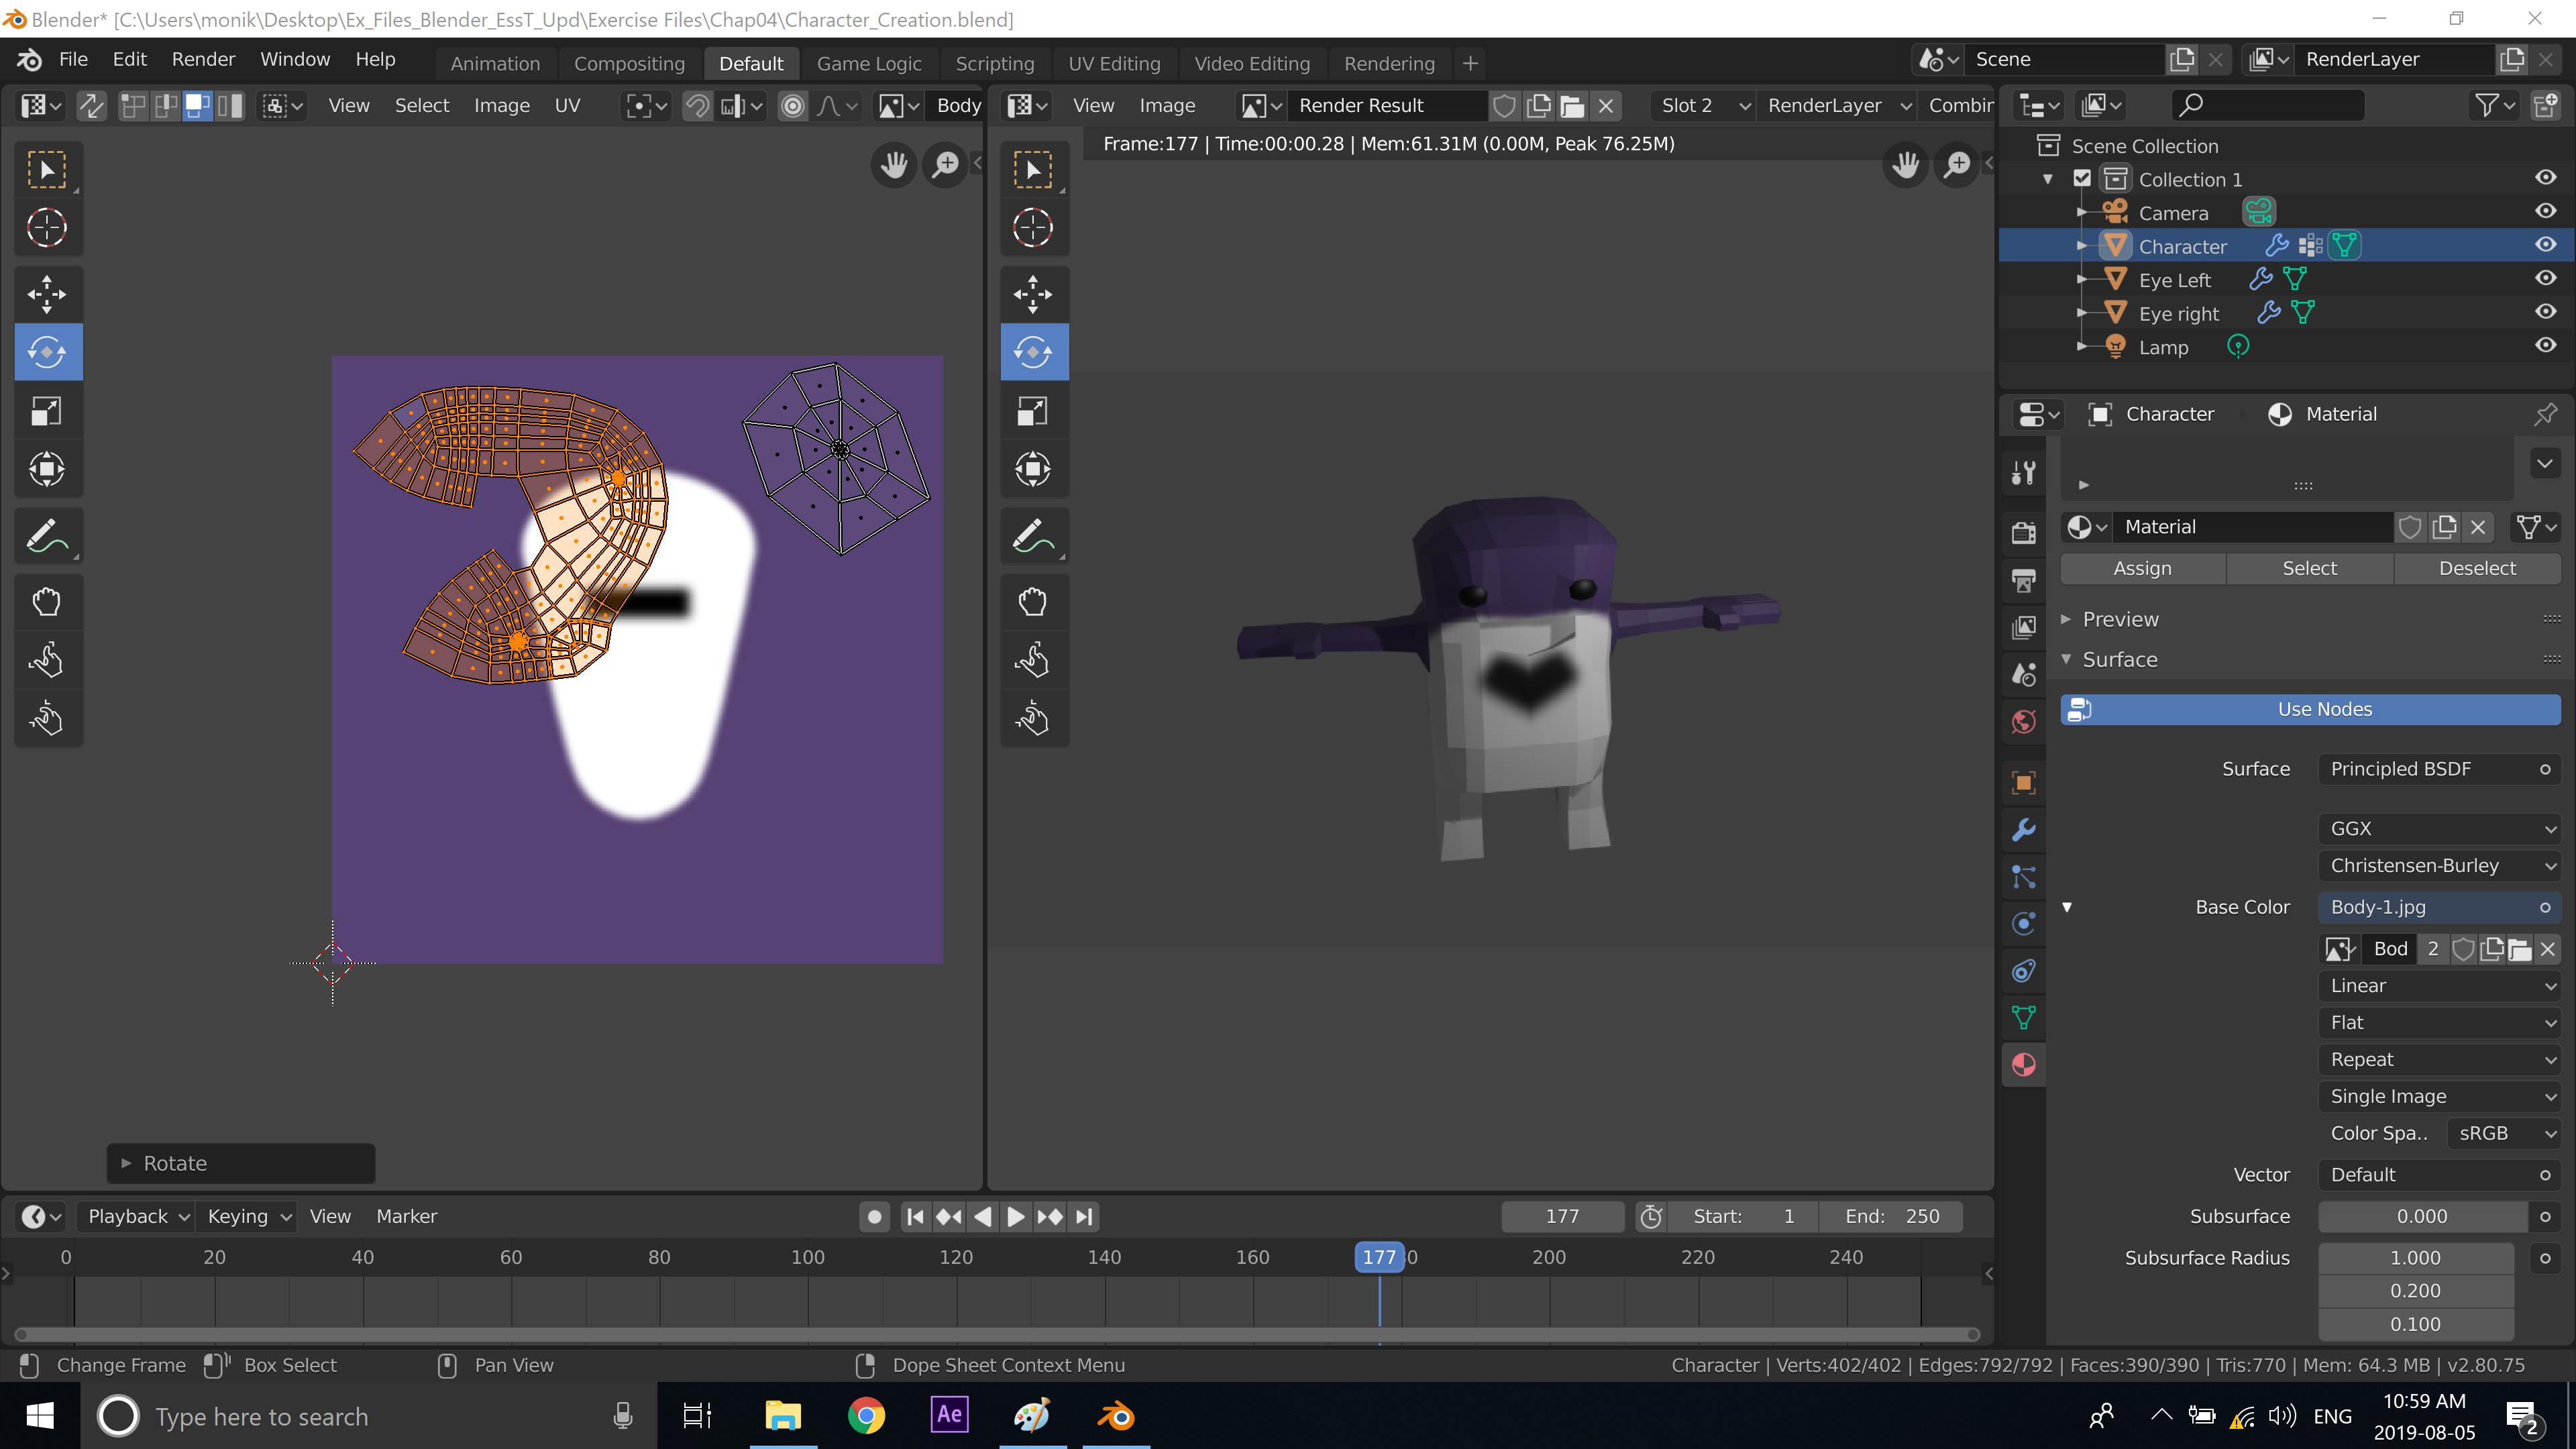 UV Mapping Blender 3D Character creation under Feifei Digital Ltd   Monika Szucs